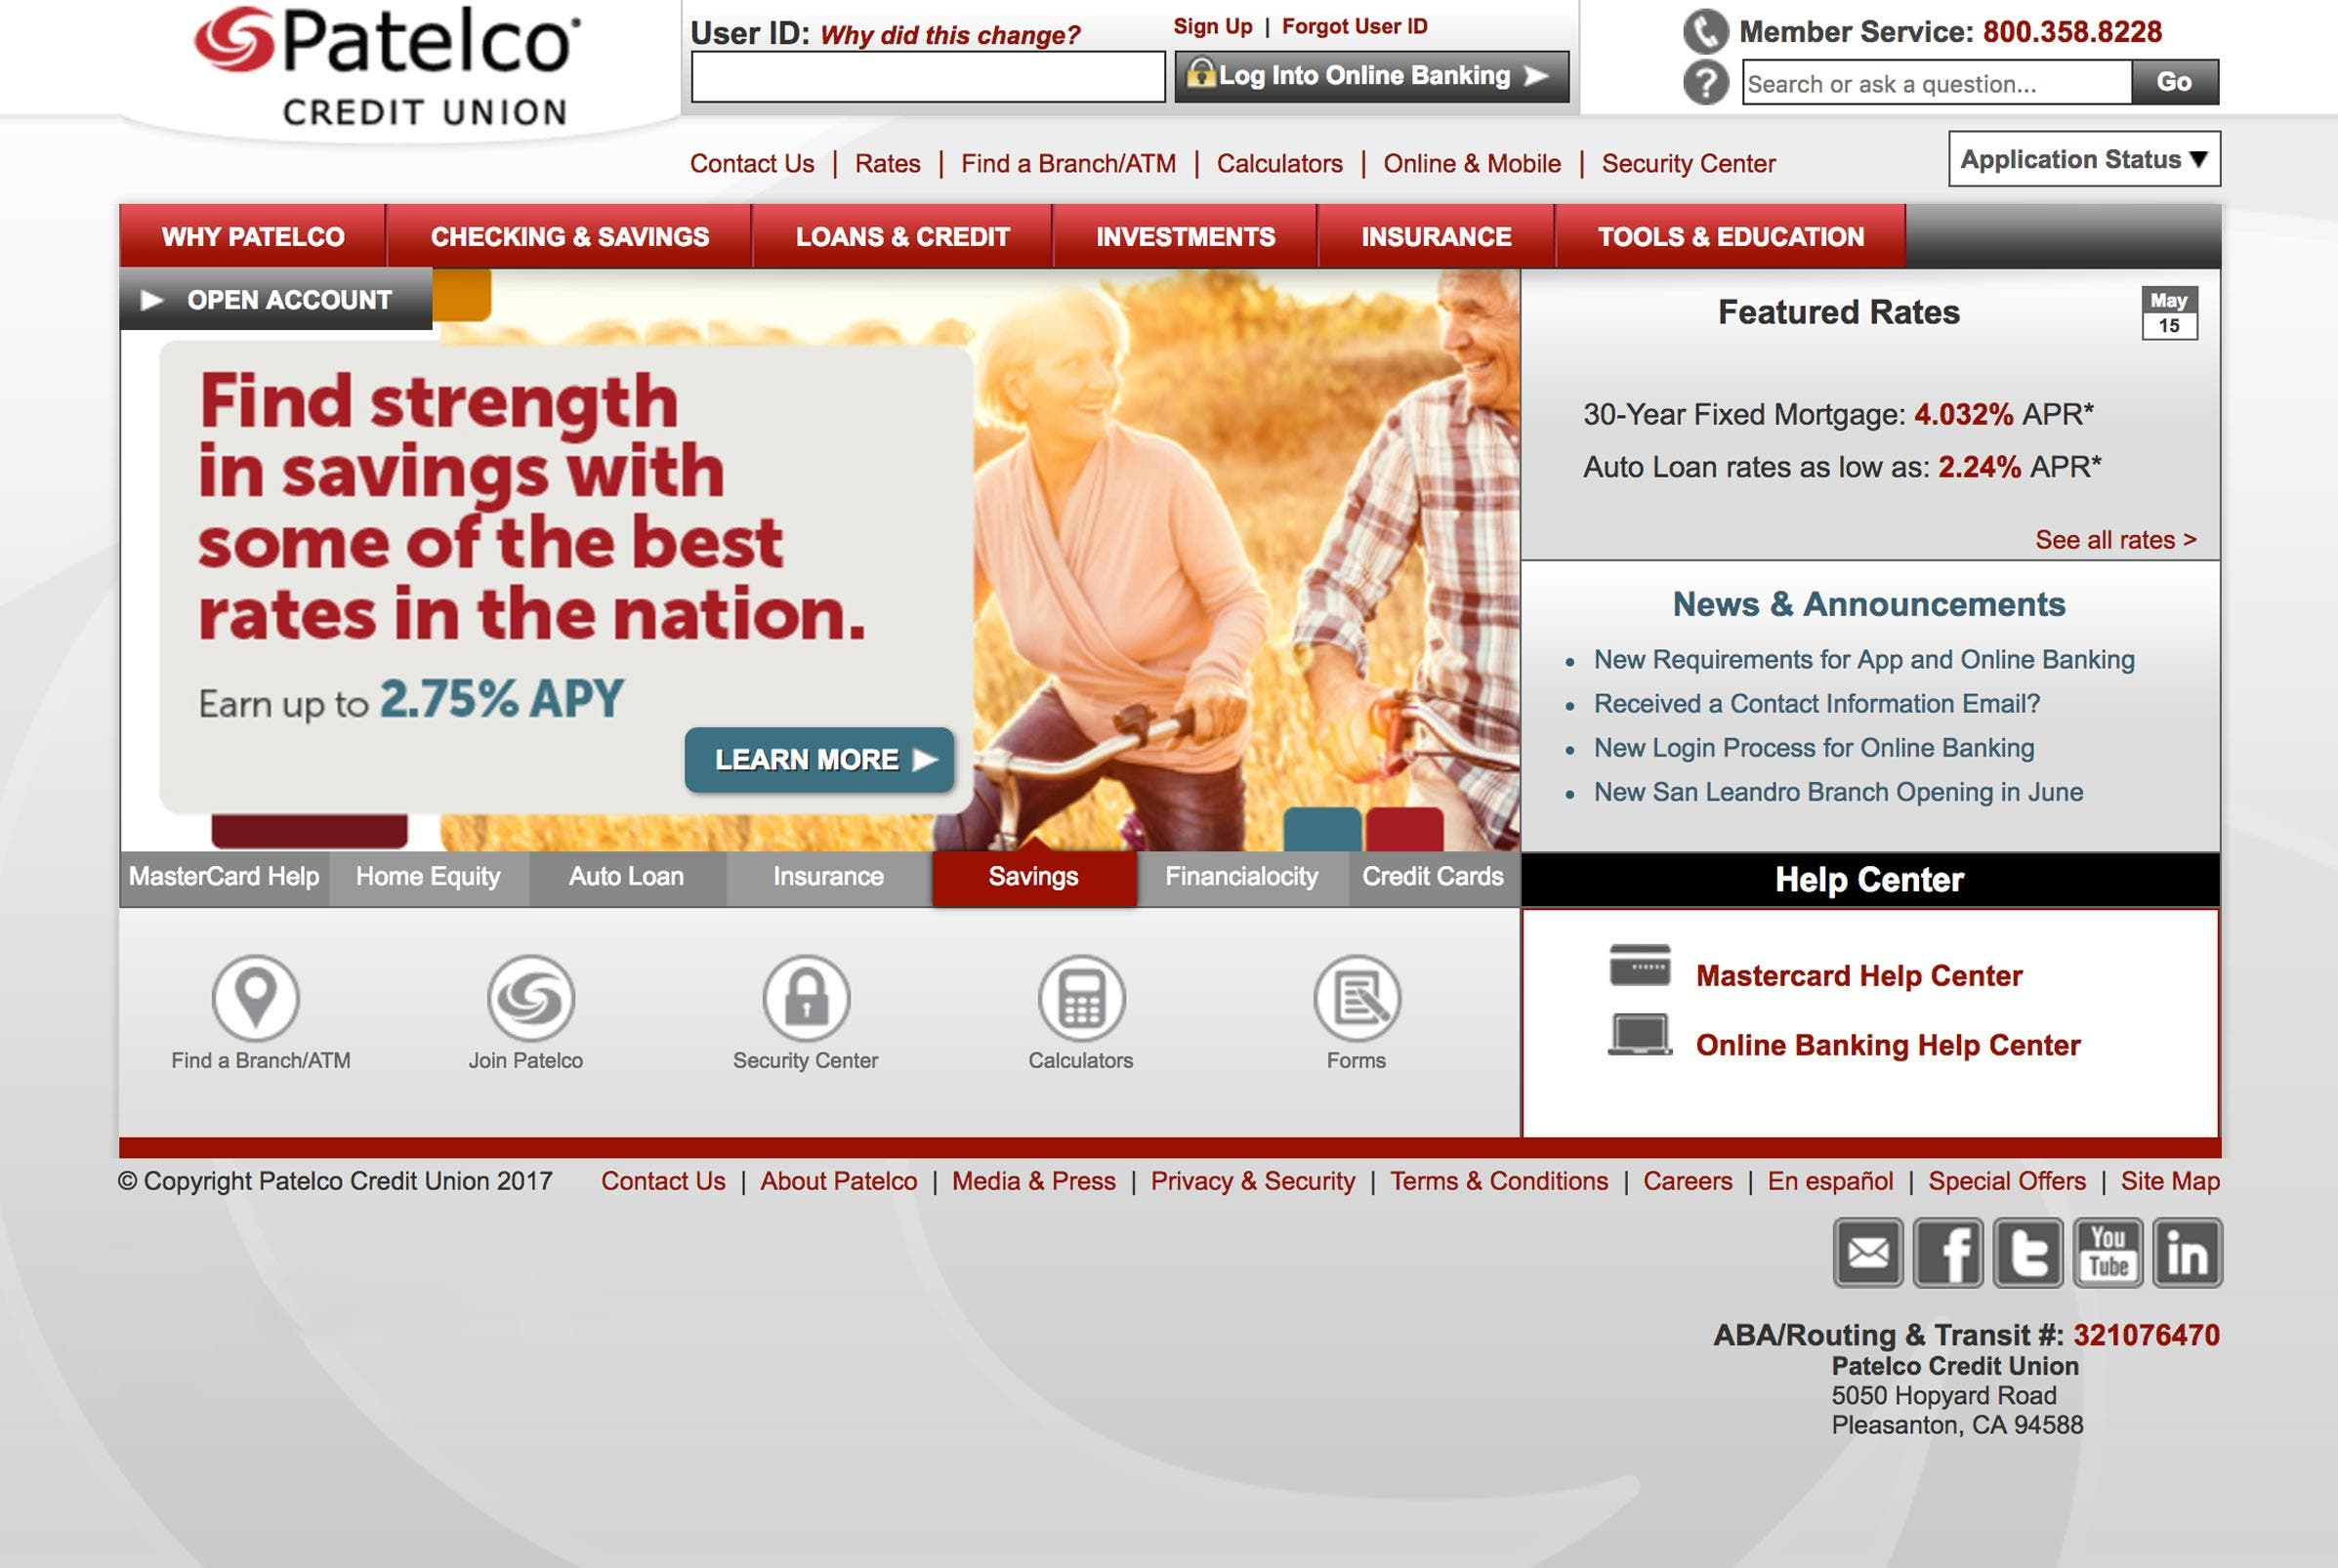 Courtesy of Patelco Credit Union